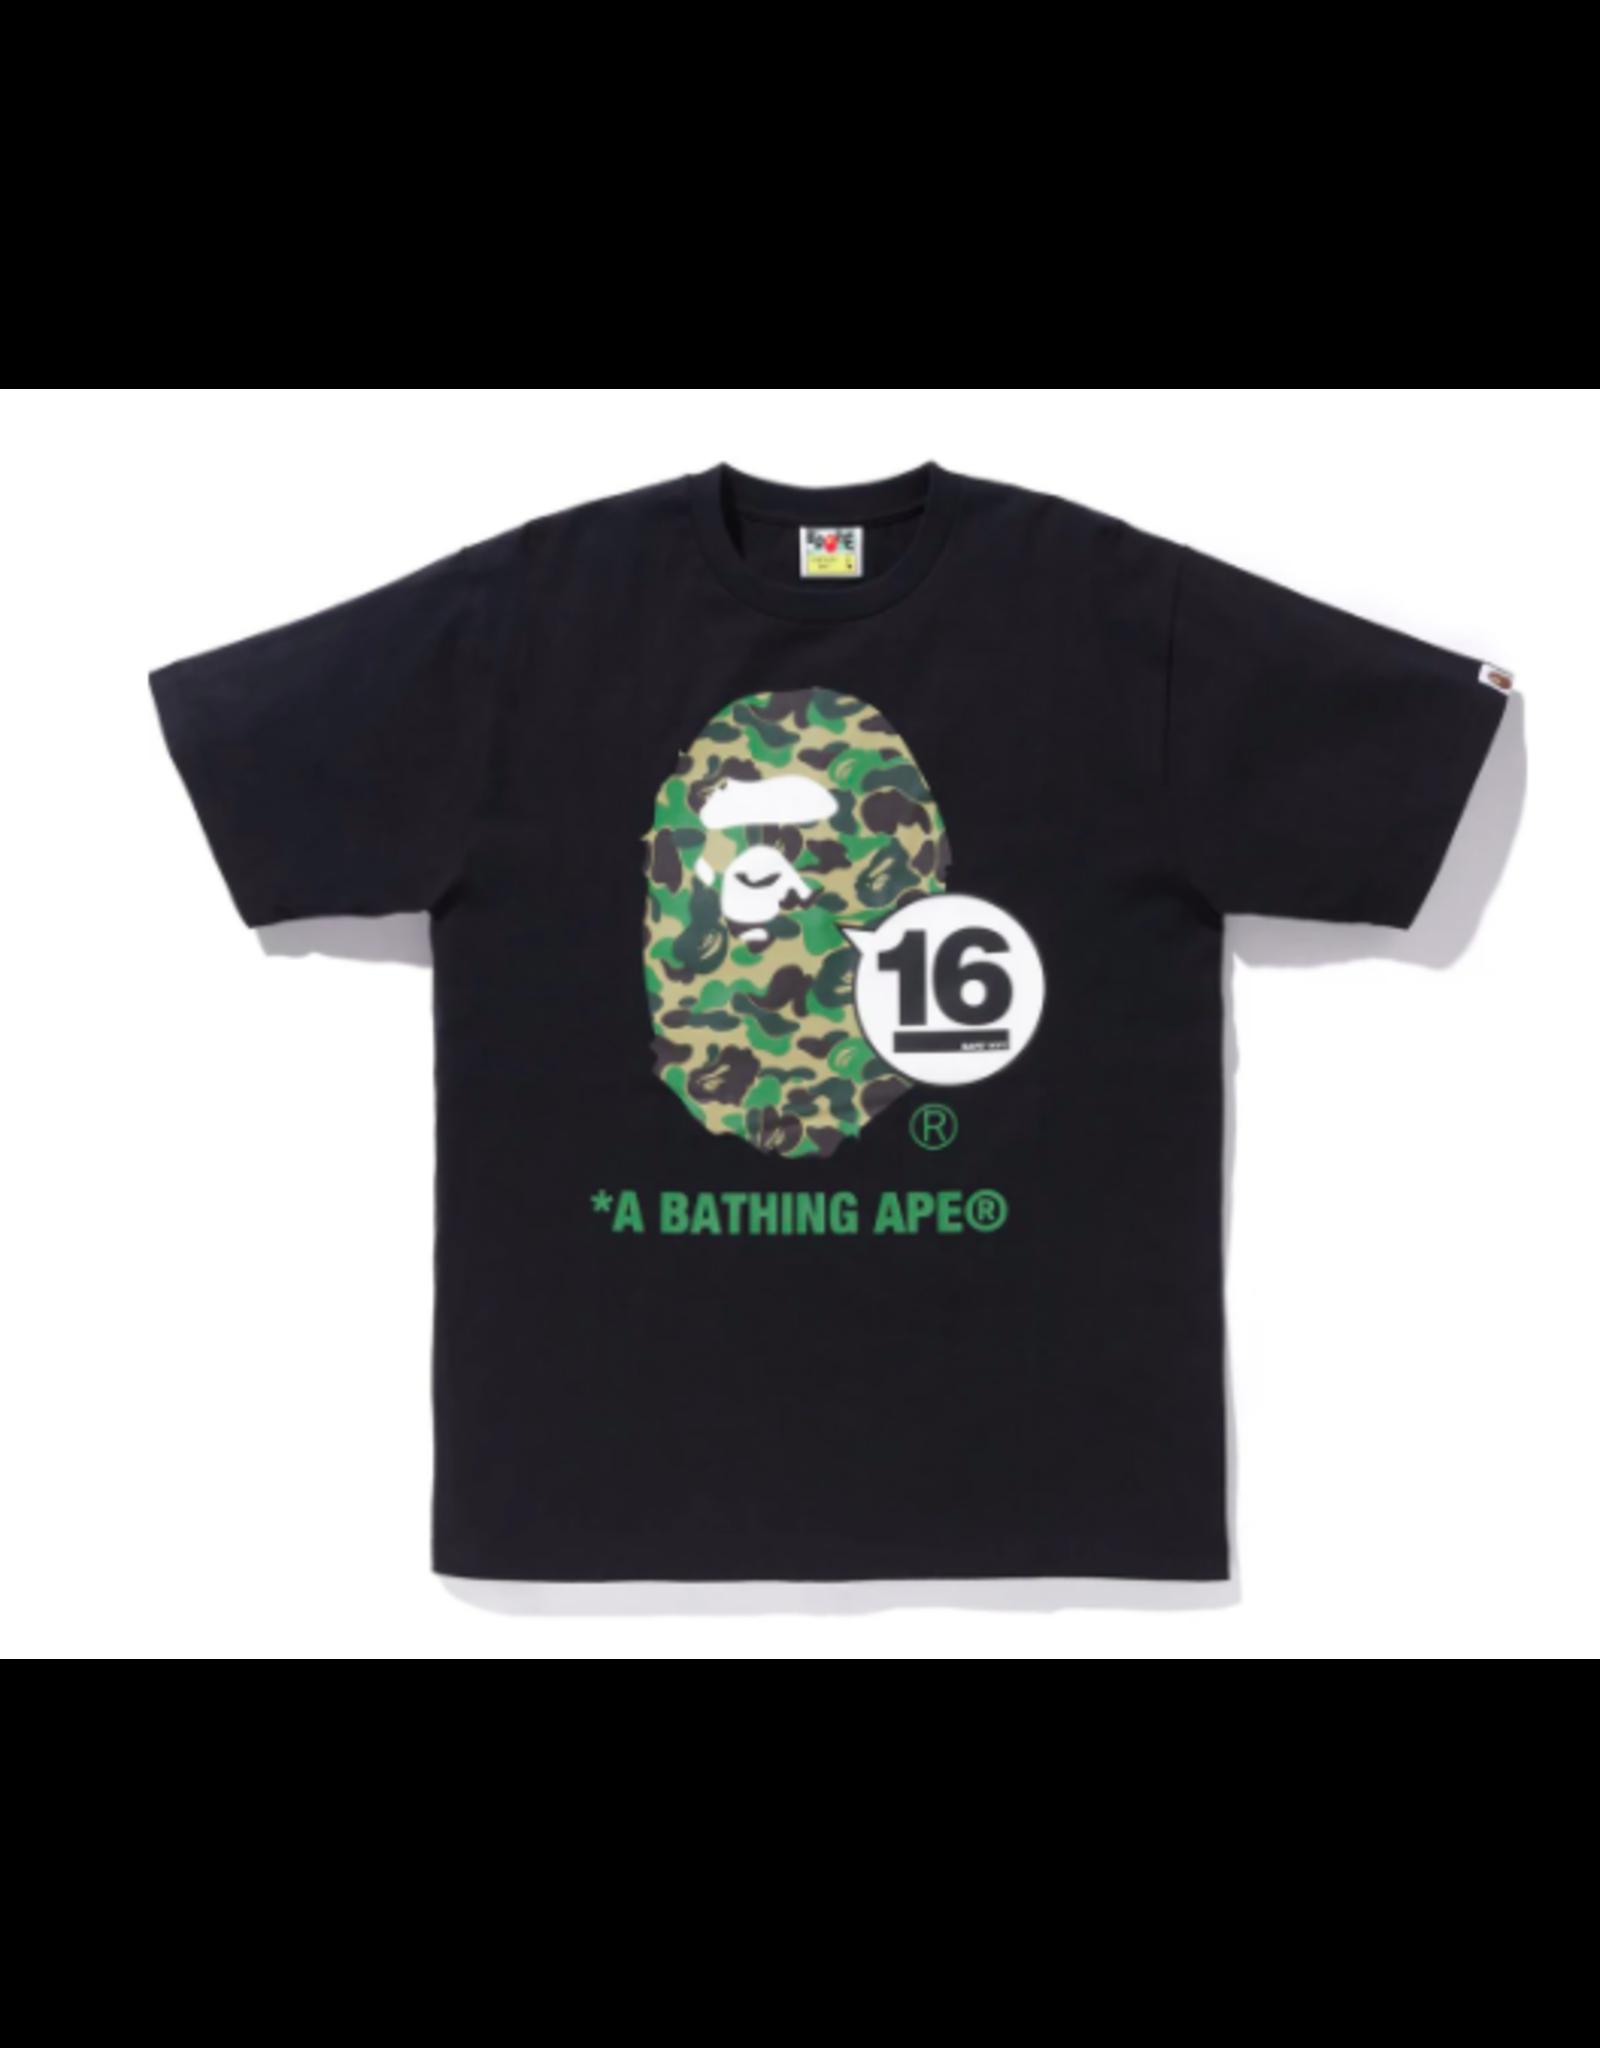 BAPE Bape Store New York 16th Anniversary BLK XL